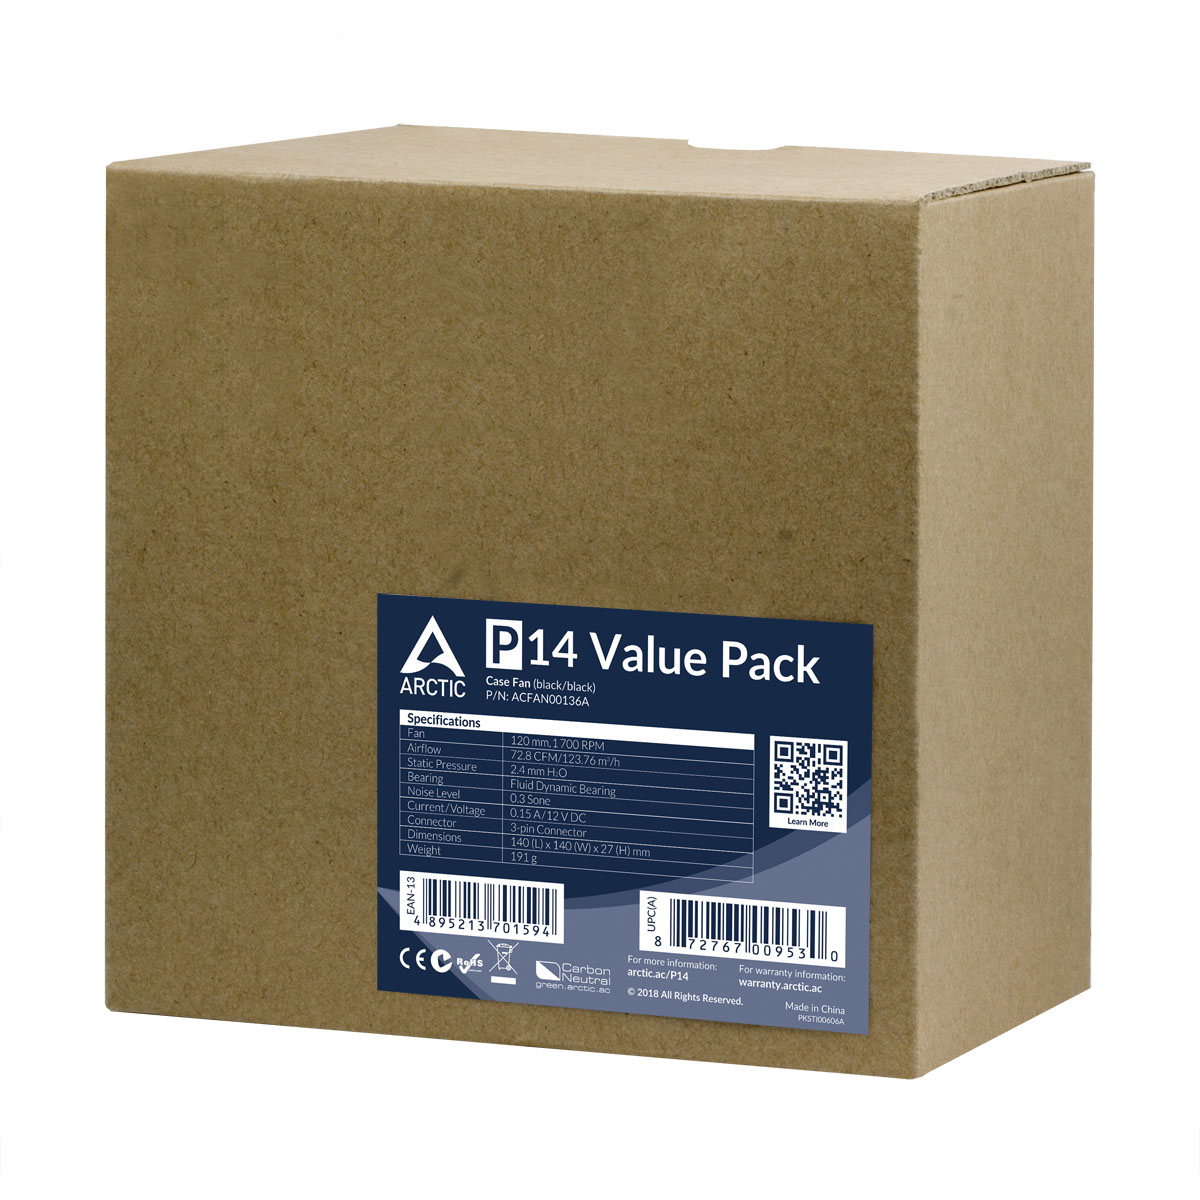 P14_Value_Pack_G05